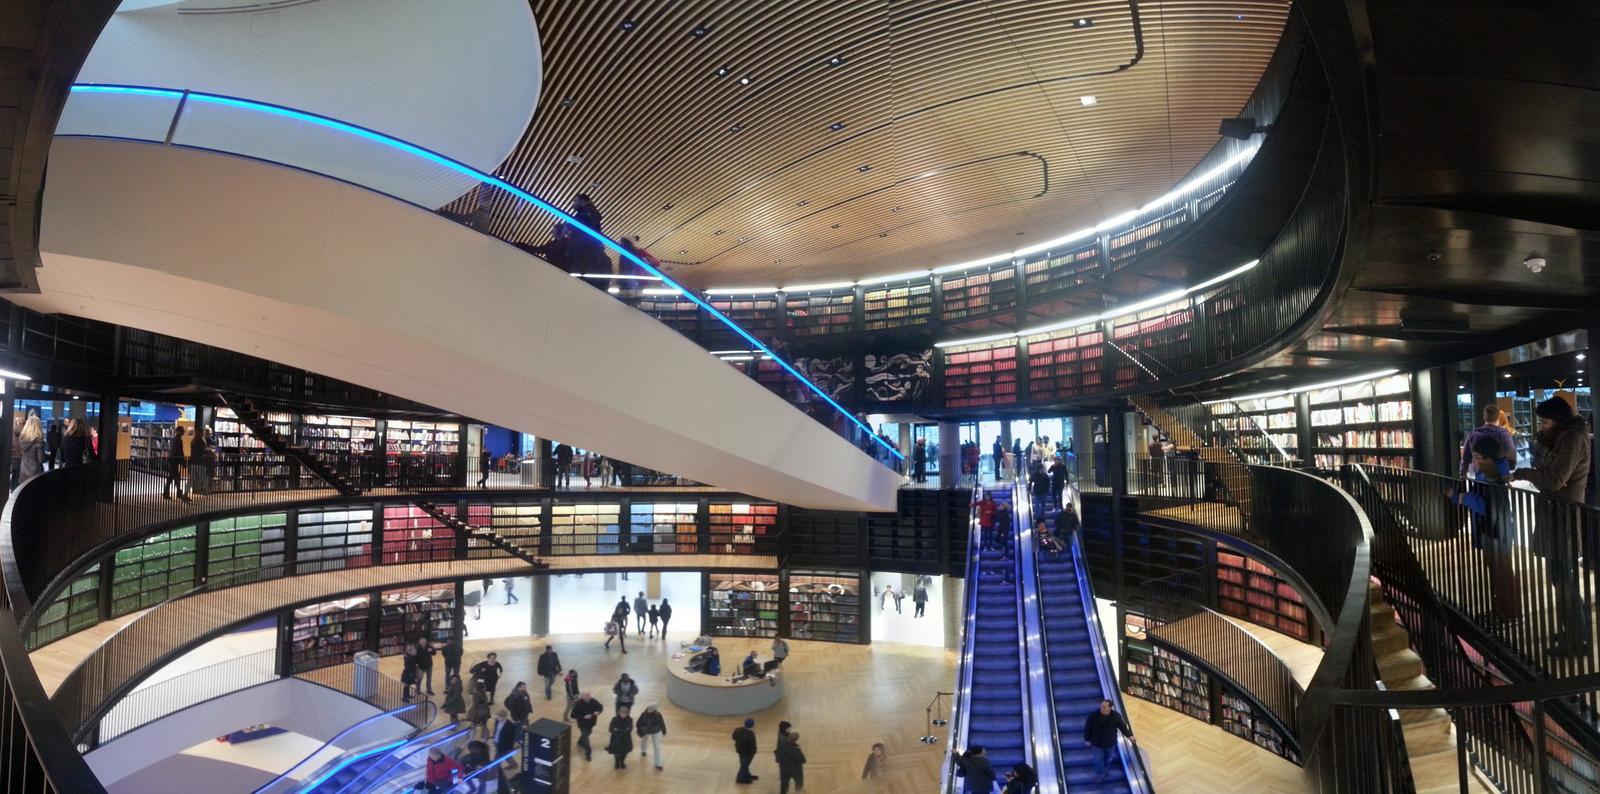 16._Library_of_Birmingham